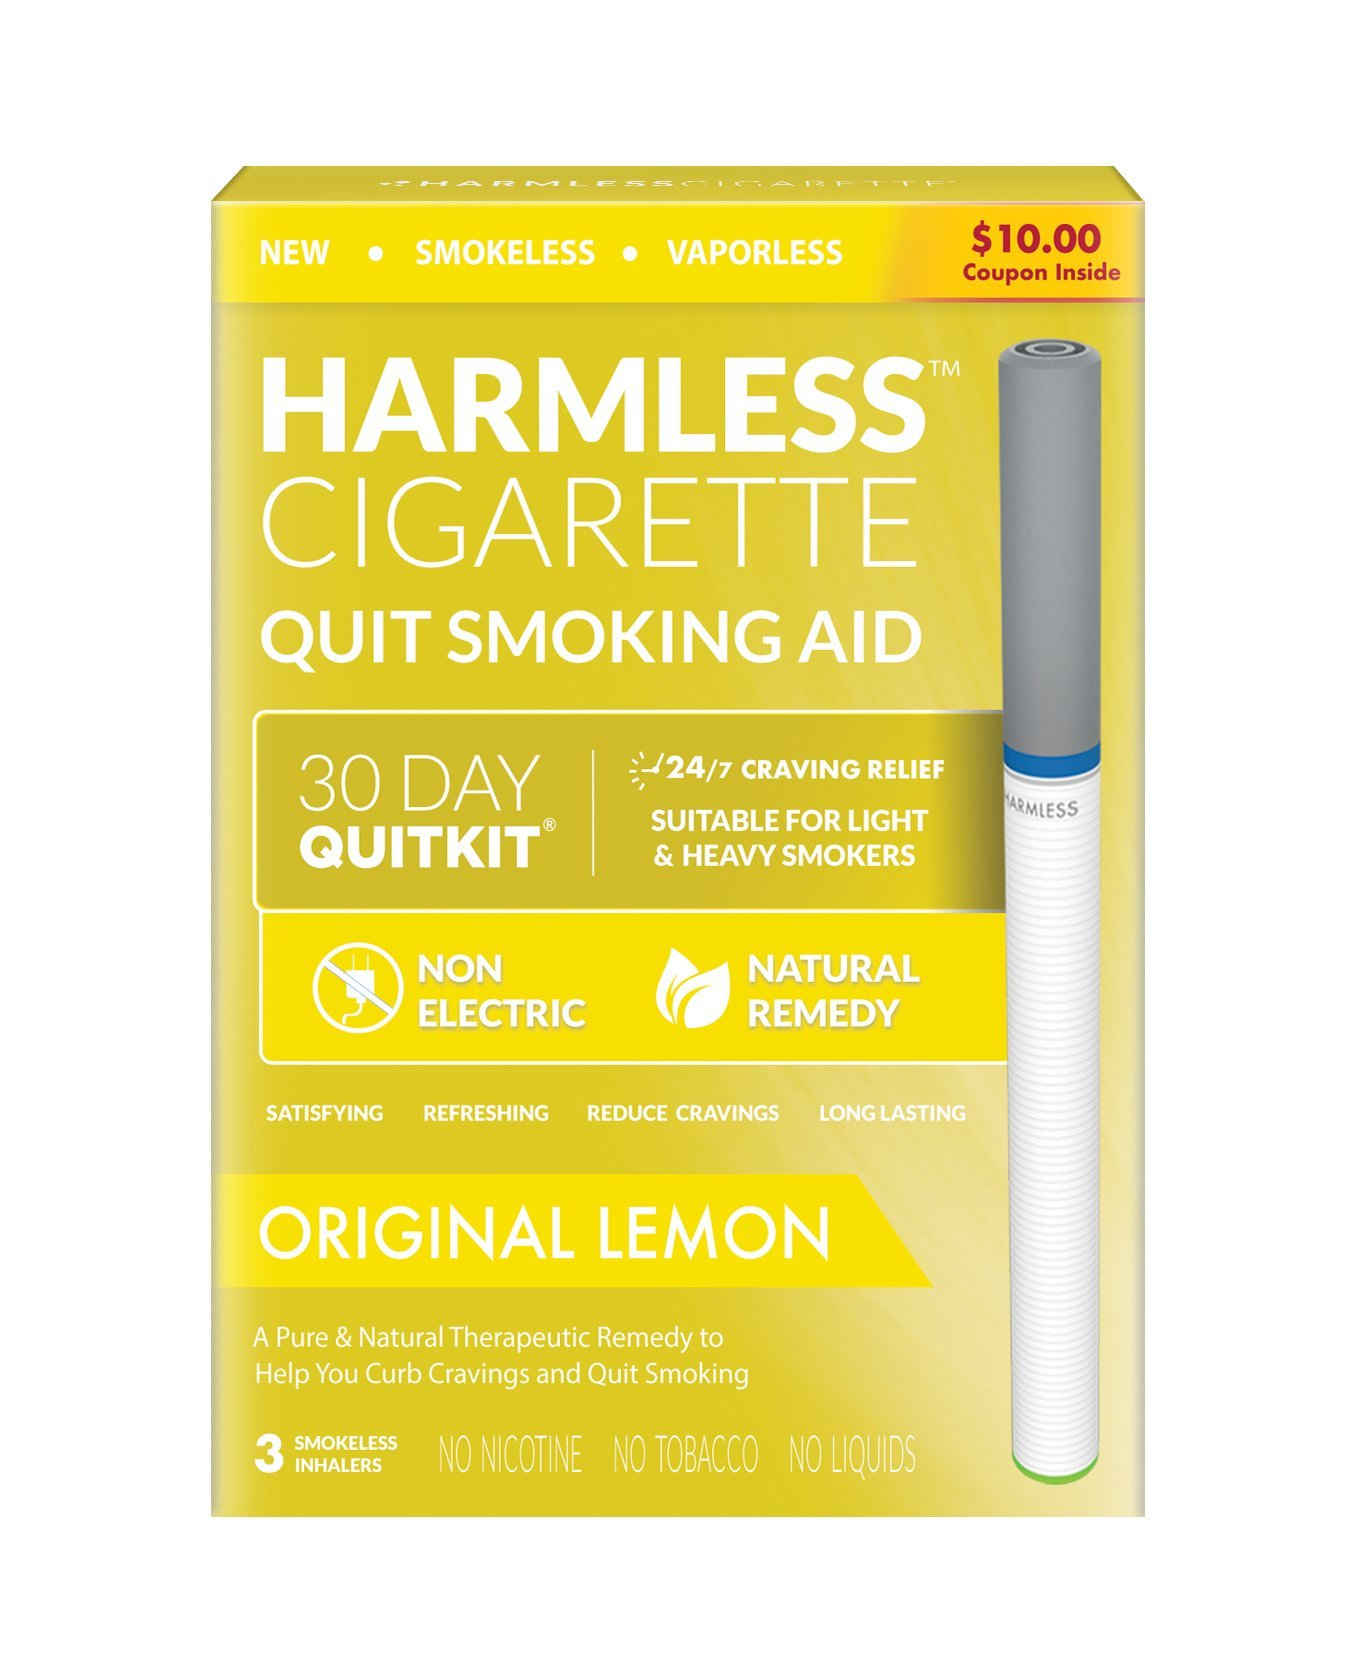 4 Week Quit Kit/Natural Quit Smoking Remedy/Therapeutic Quit Smoking Product/Stop Smoking Aid to Help Quit Smoking/Best Stop Smoking Product. (Original Lemon, 4 Weed Quit Kit)